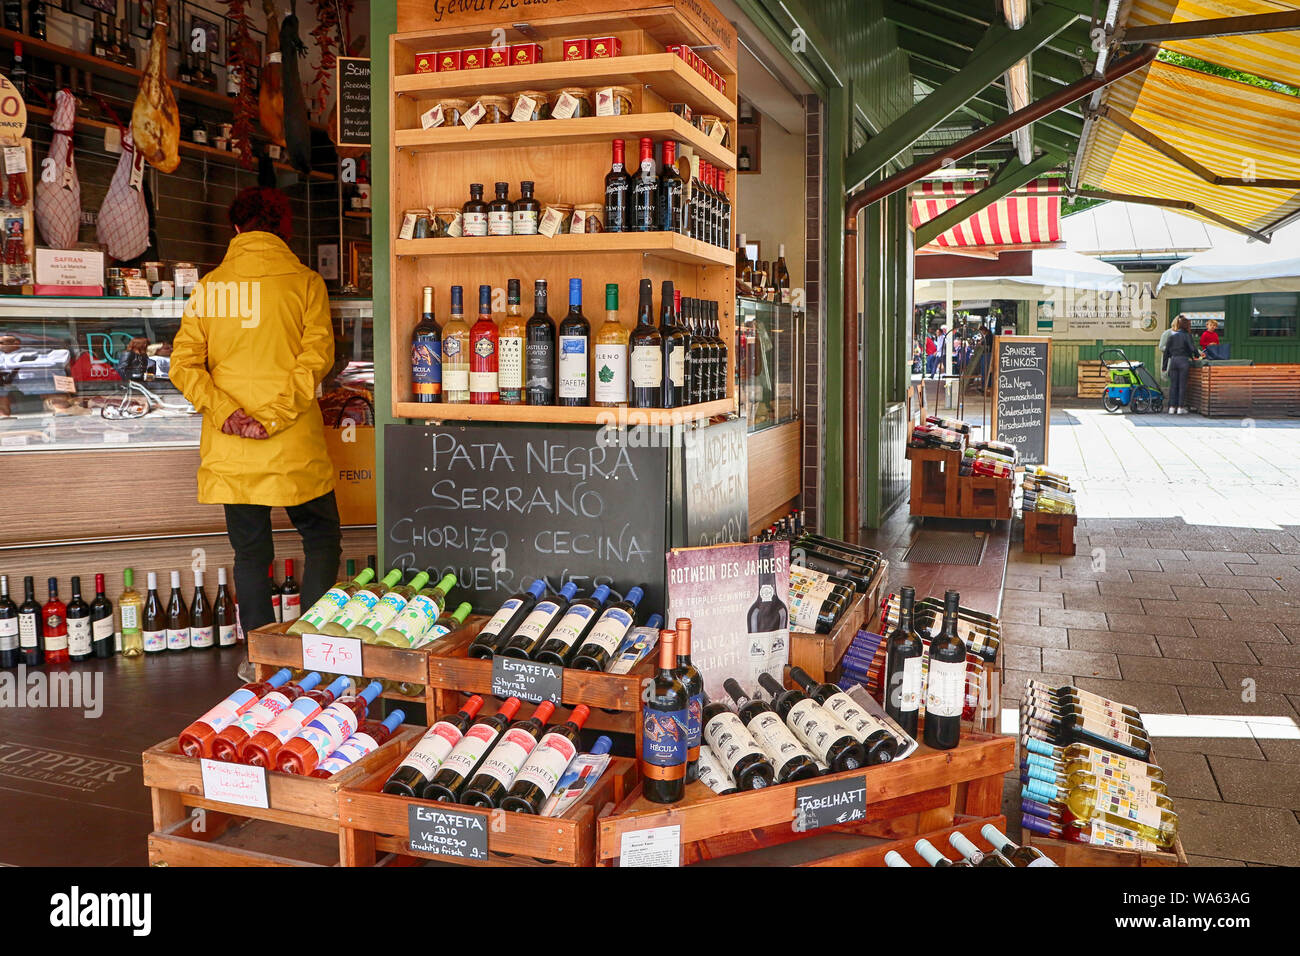 MUNICH, GERMANY- AUGUST 16, 2019 Gourmet food and wine shop offers international specialties and Bavarian delicacy at Viktualienmarkt, Munich landmark Stock Photo